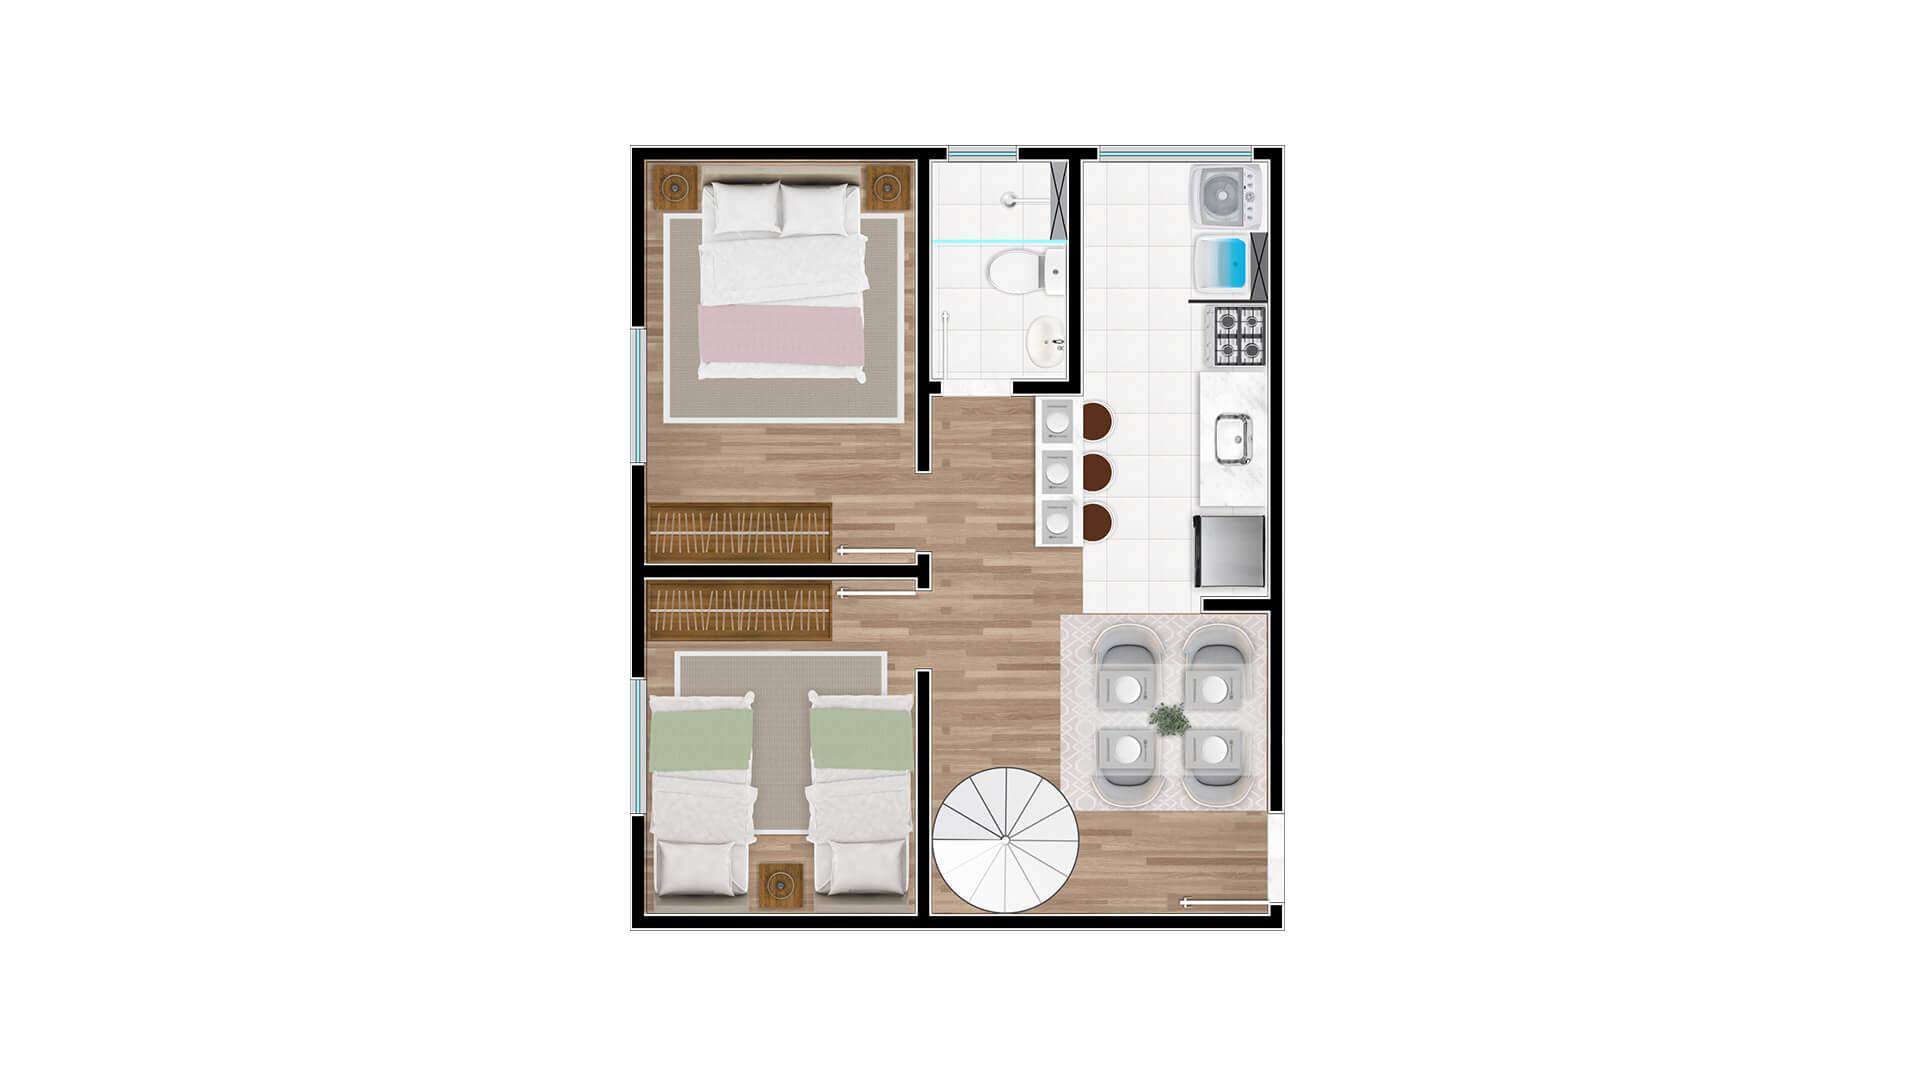 Cobertura Tipo 1 - 1º andar - Millennium Residence